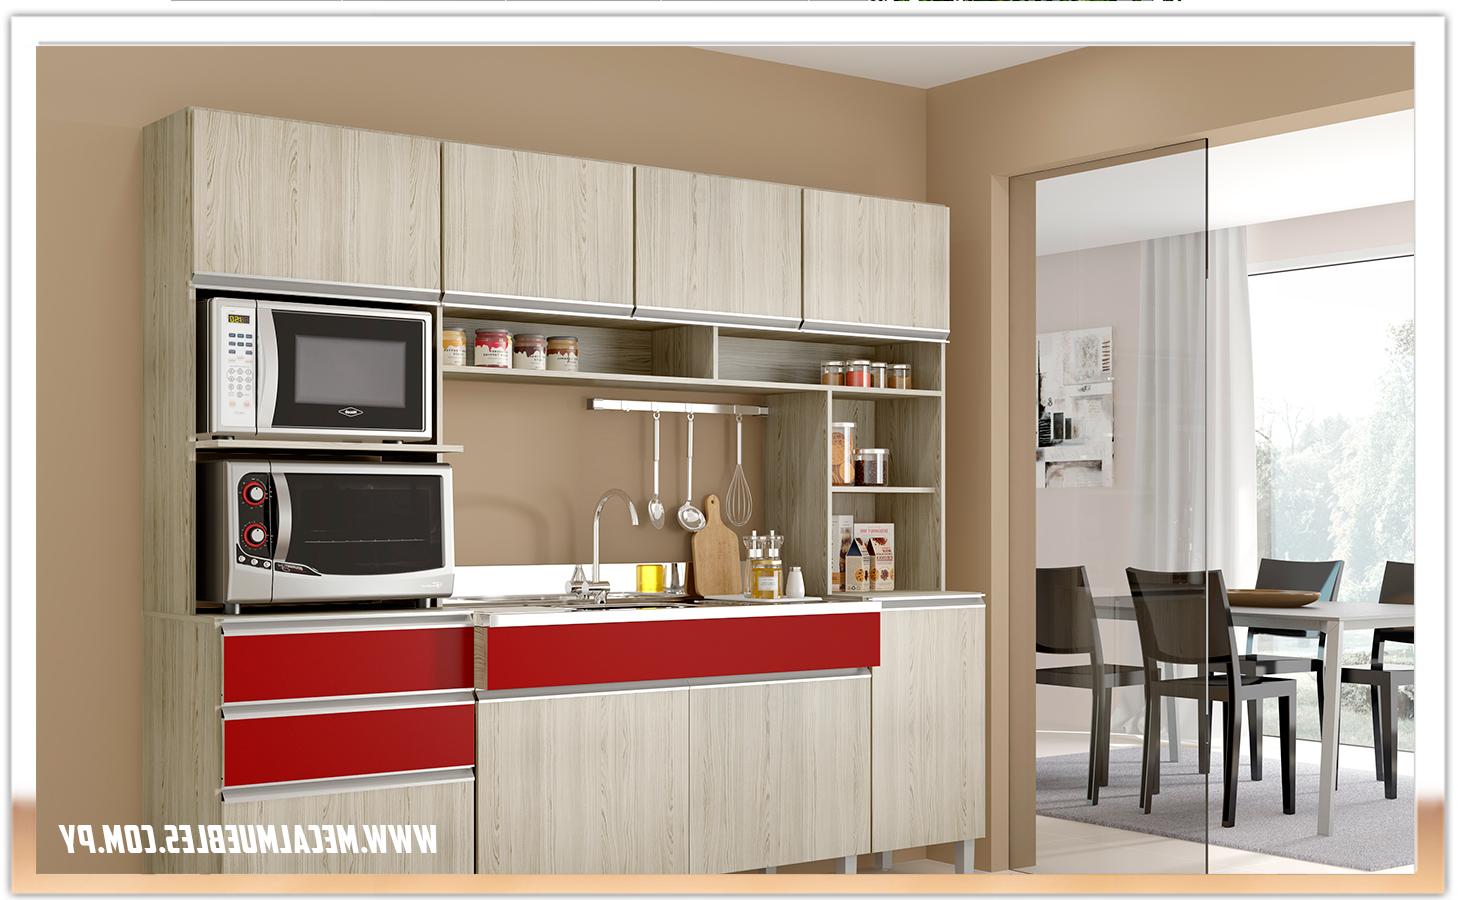 Muebles Cocina En Kit Tqd3 Kit Cocina Kit De Cocina 8011